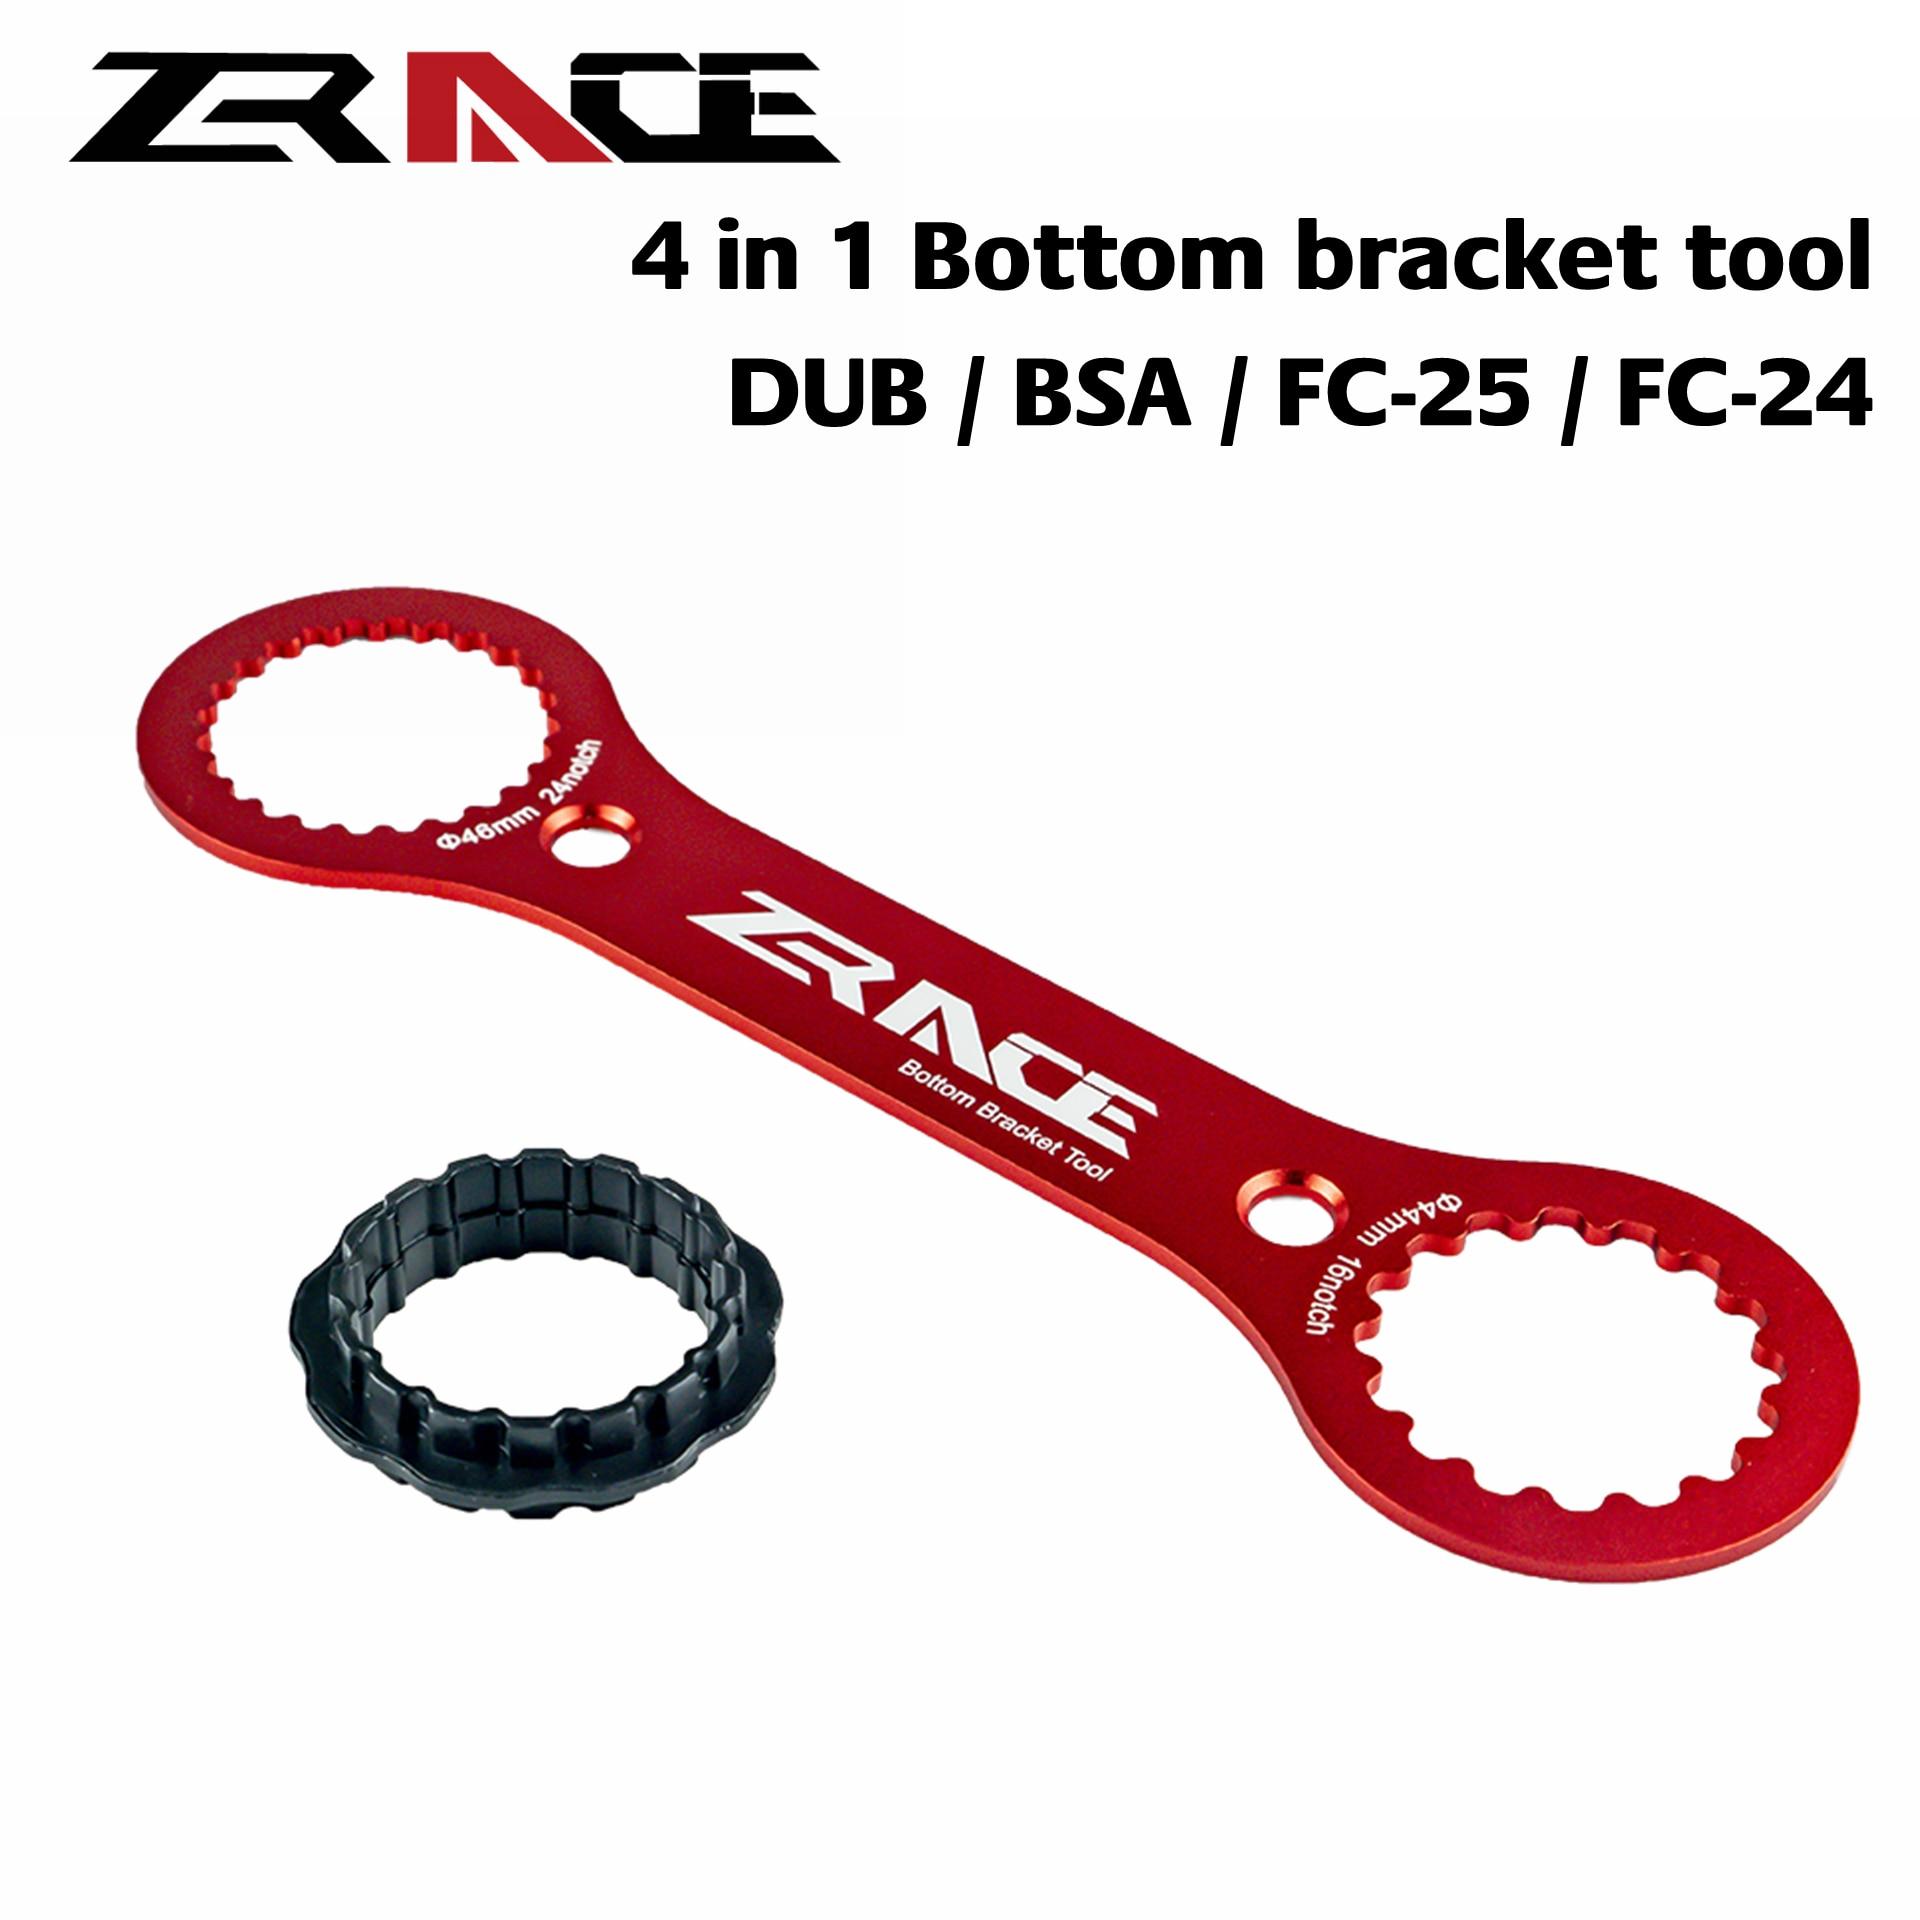 ZRACE 4 In 1 Bottom Bracket Wrench Tool , Compatible With SRAM DUB, SHIMANO BSA / FC-25 / FC-24, CNC AL7075  DUB-BSA TOOLS